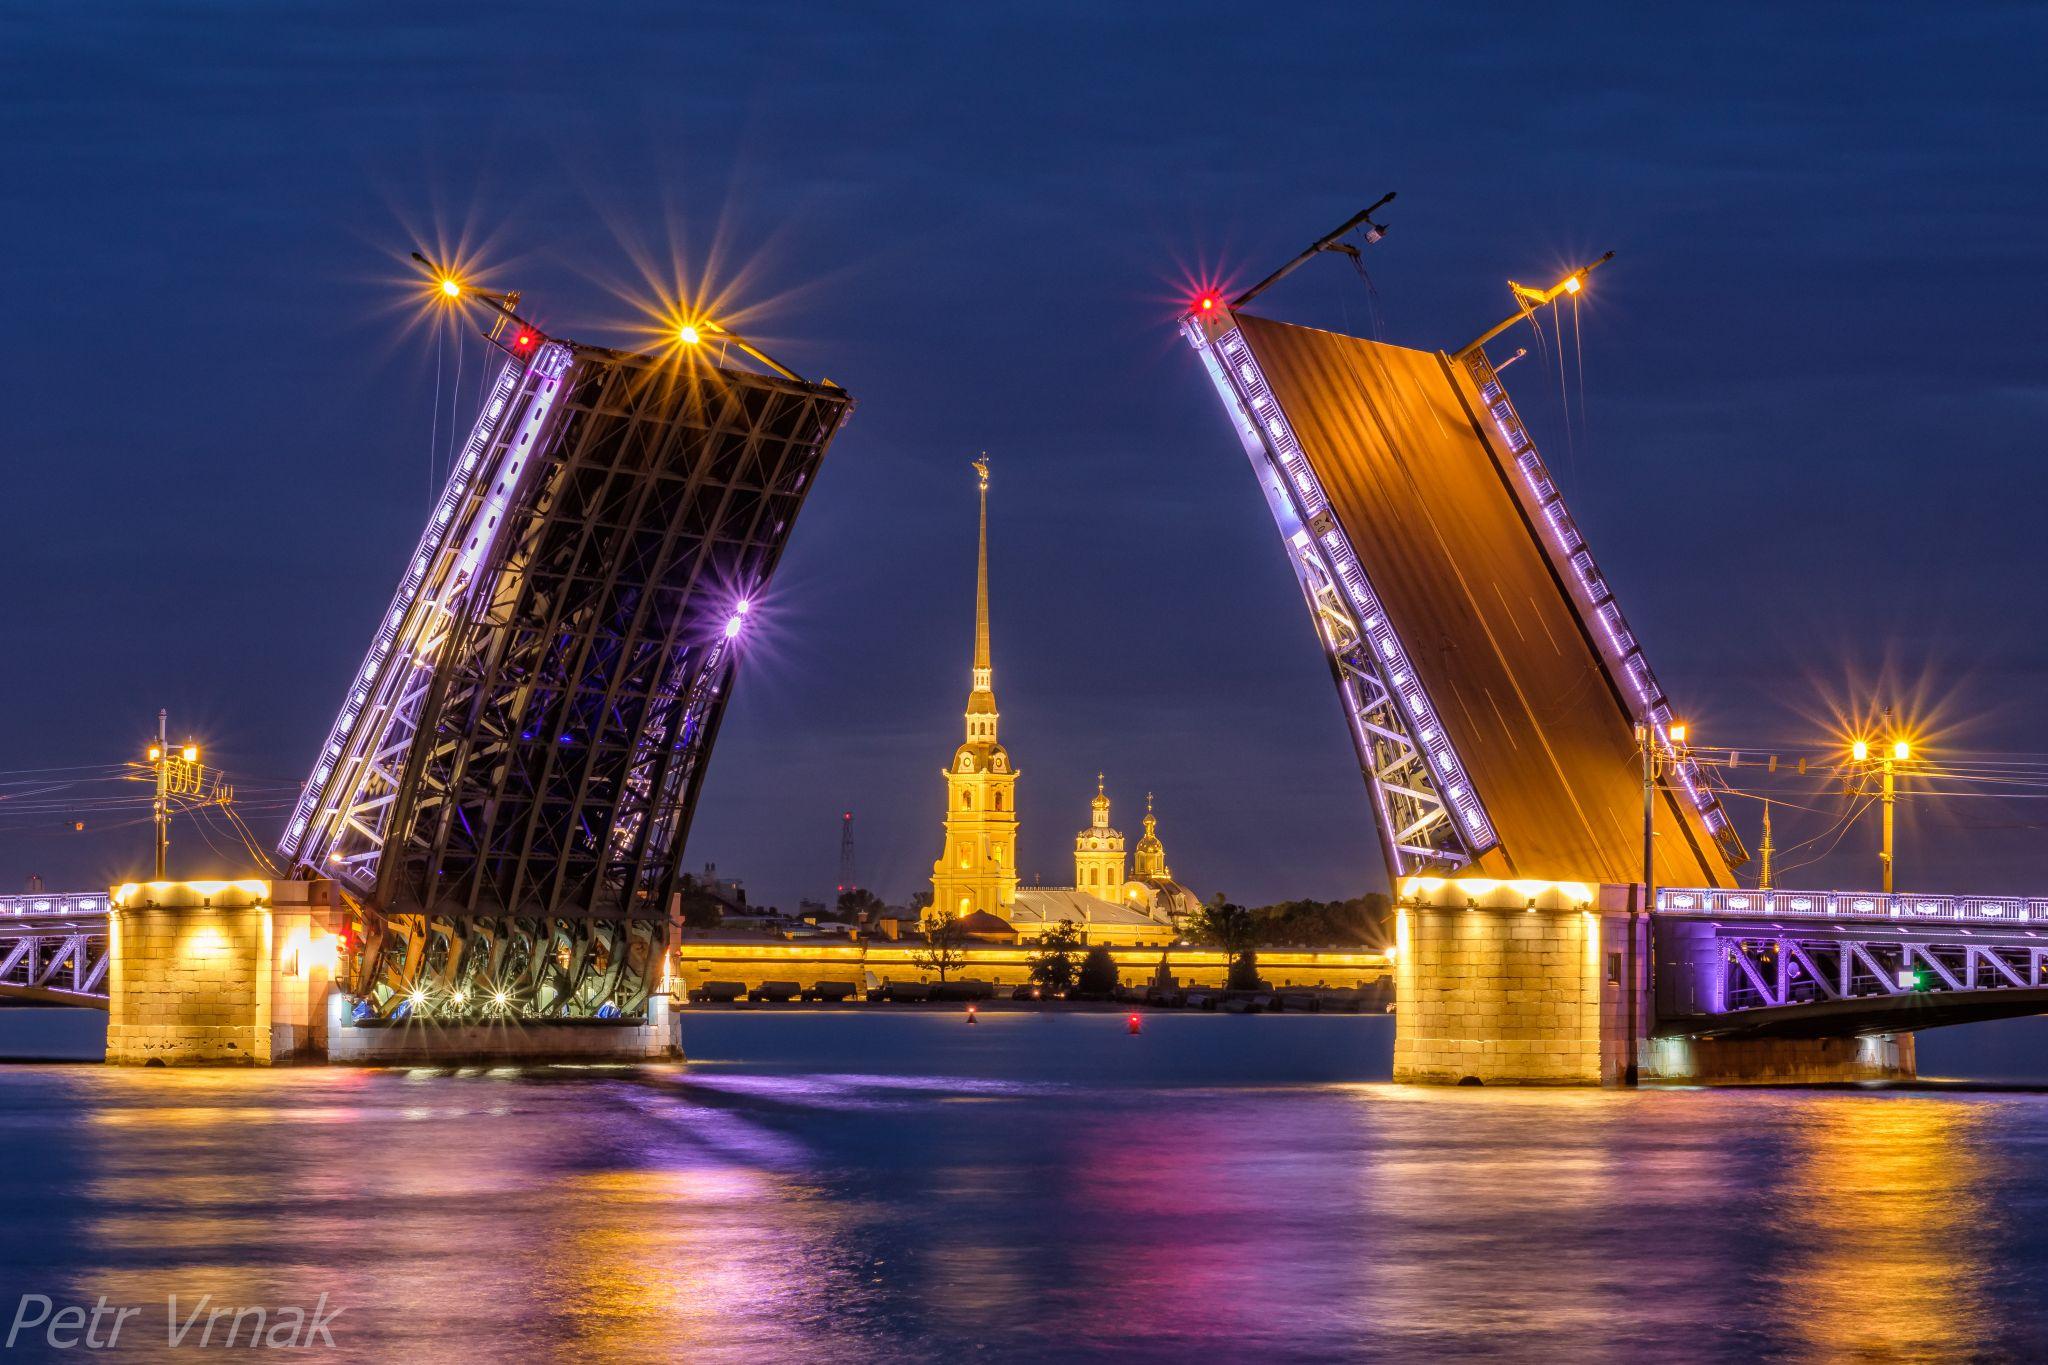 The Palace Bridge, Russian Federation